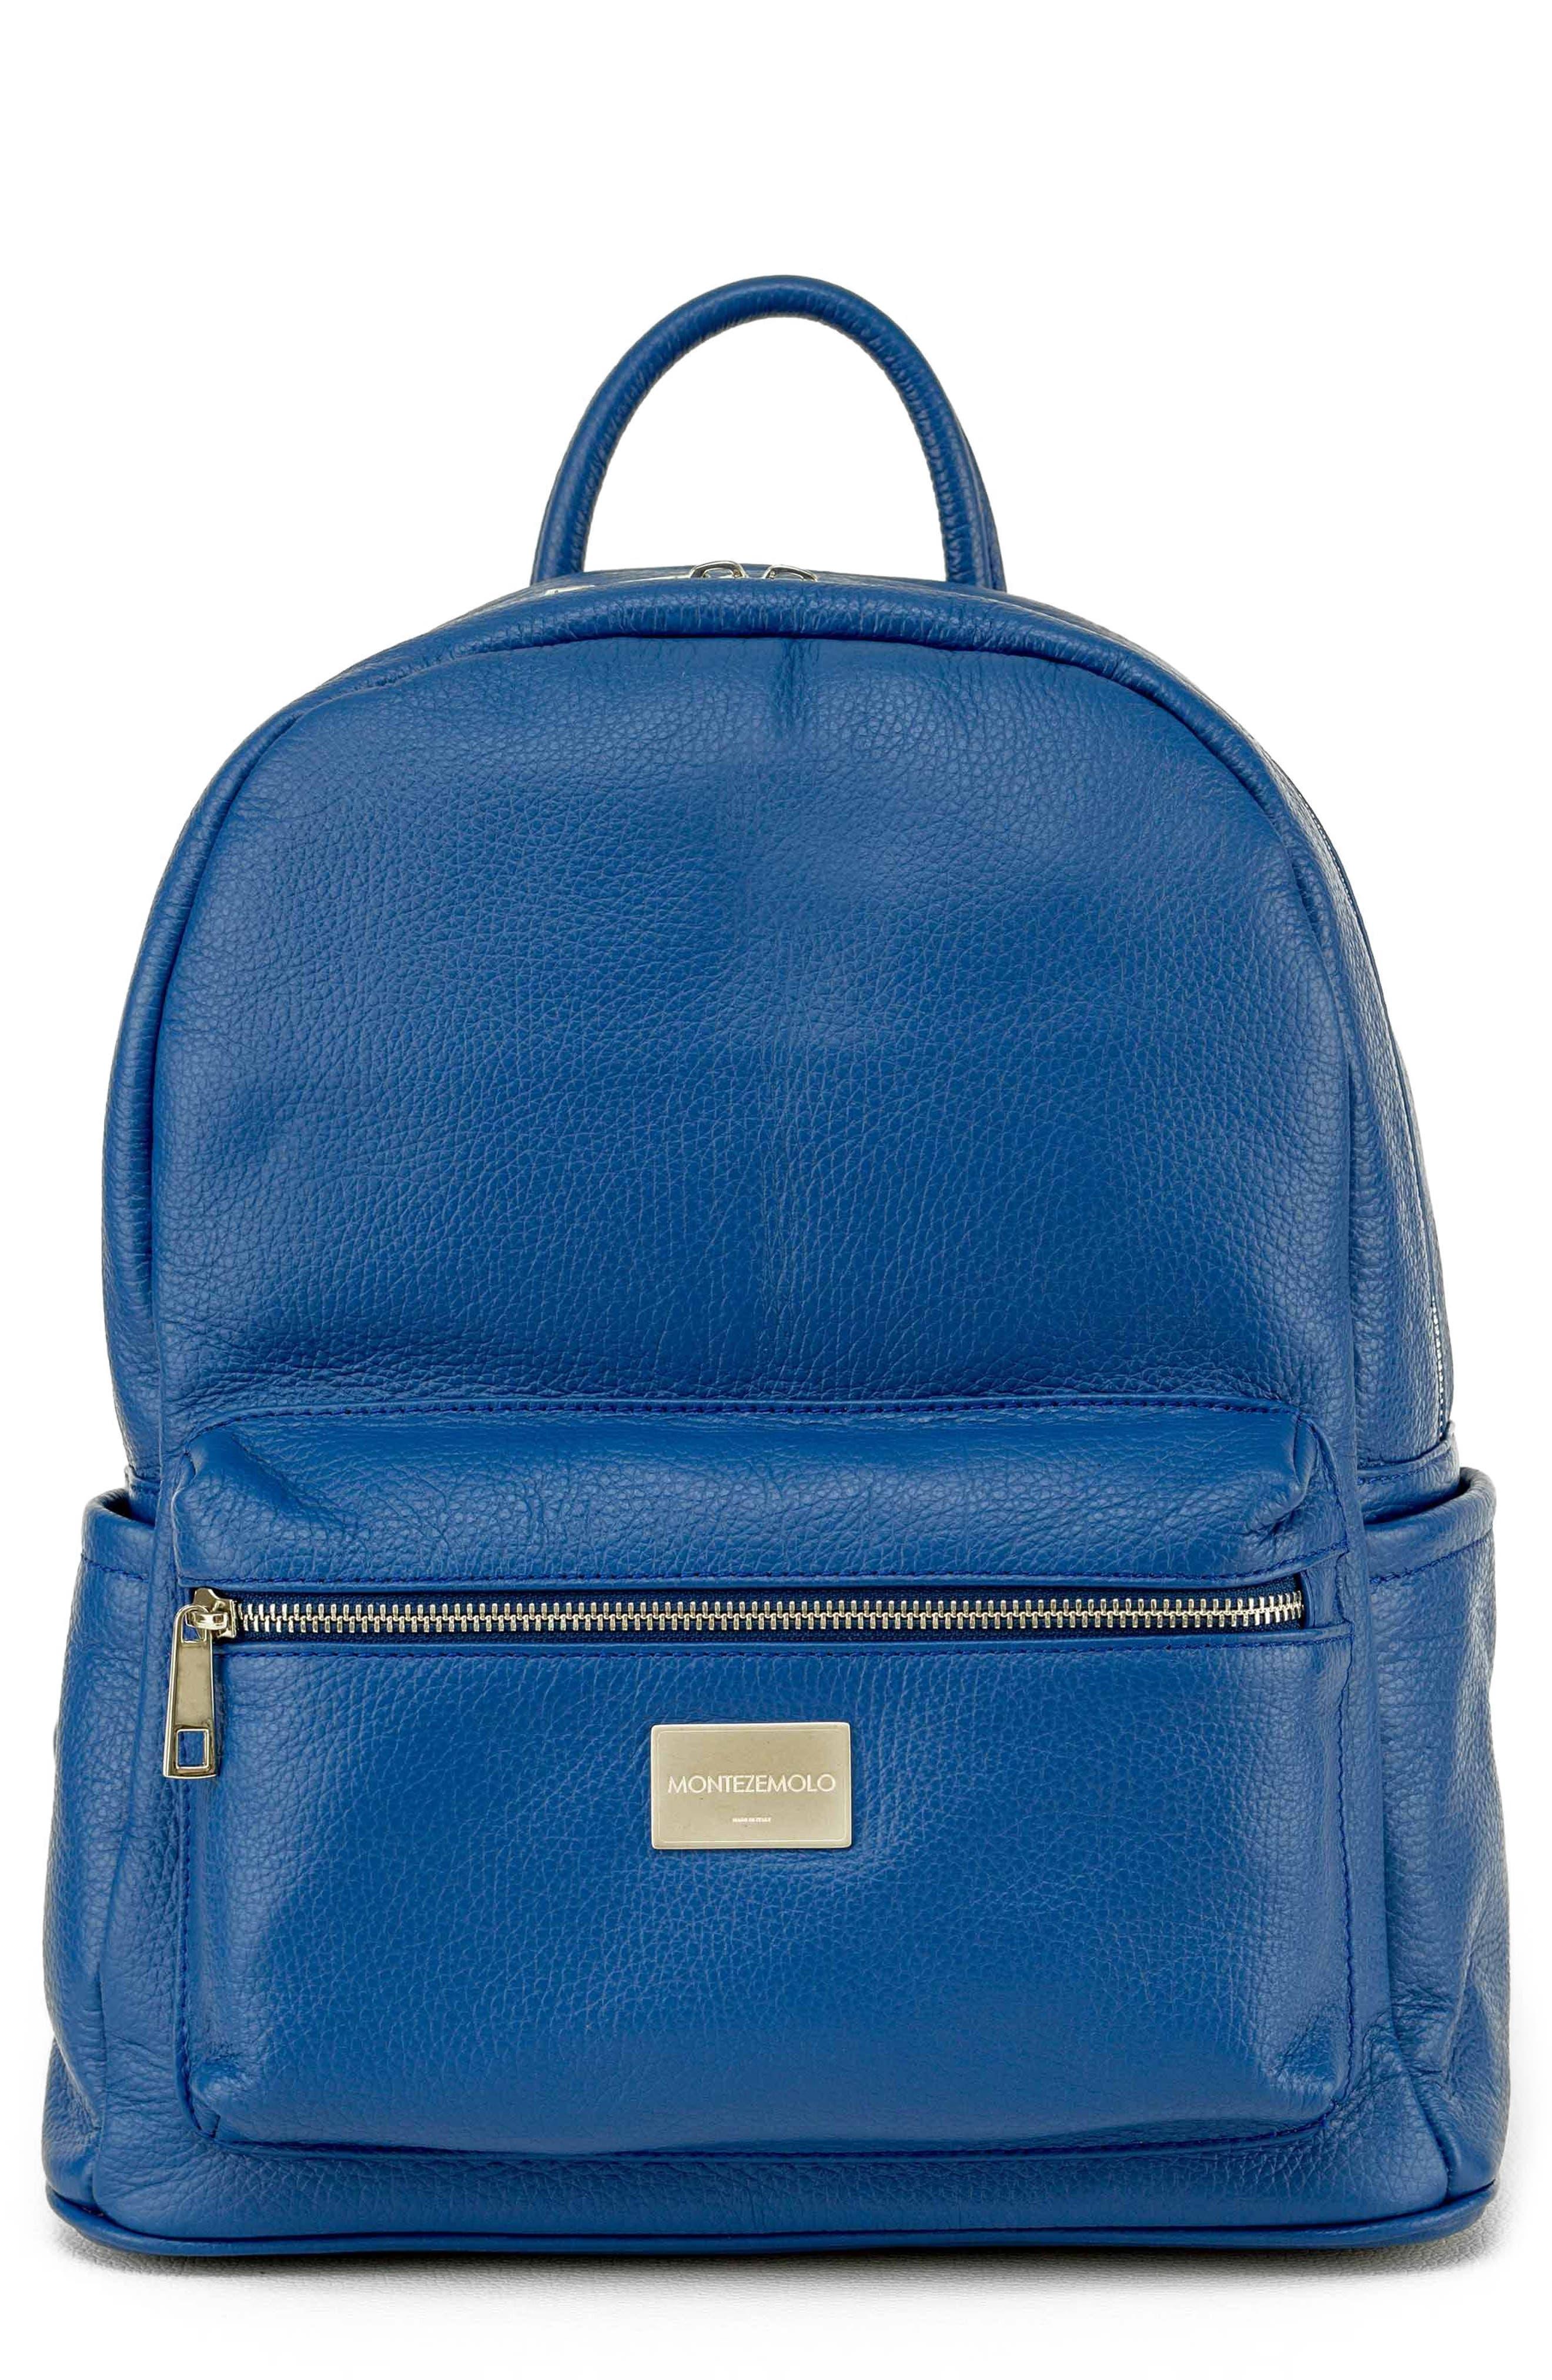 Main Image - MONTEZEMOLO Leather Backpack